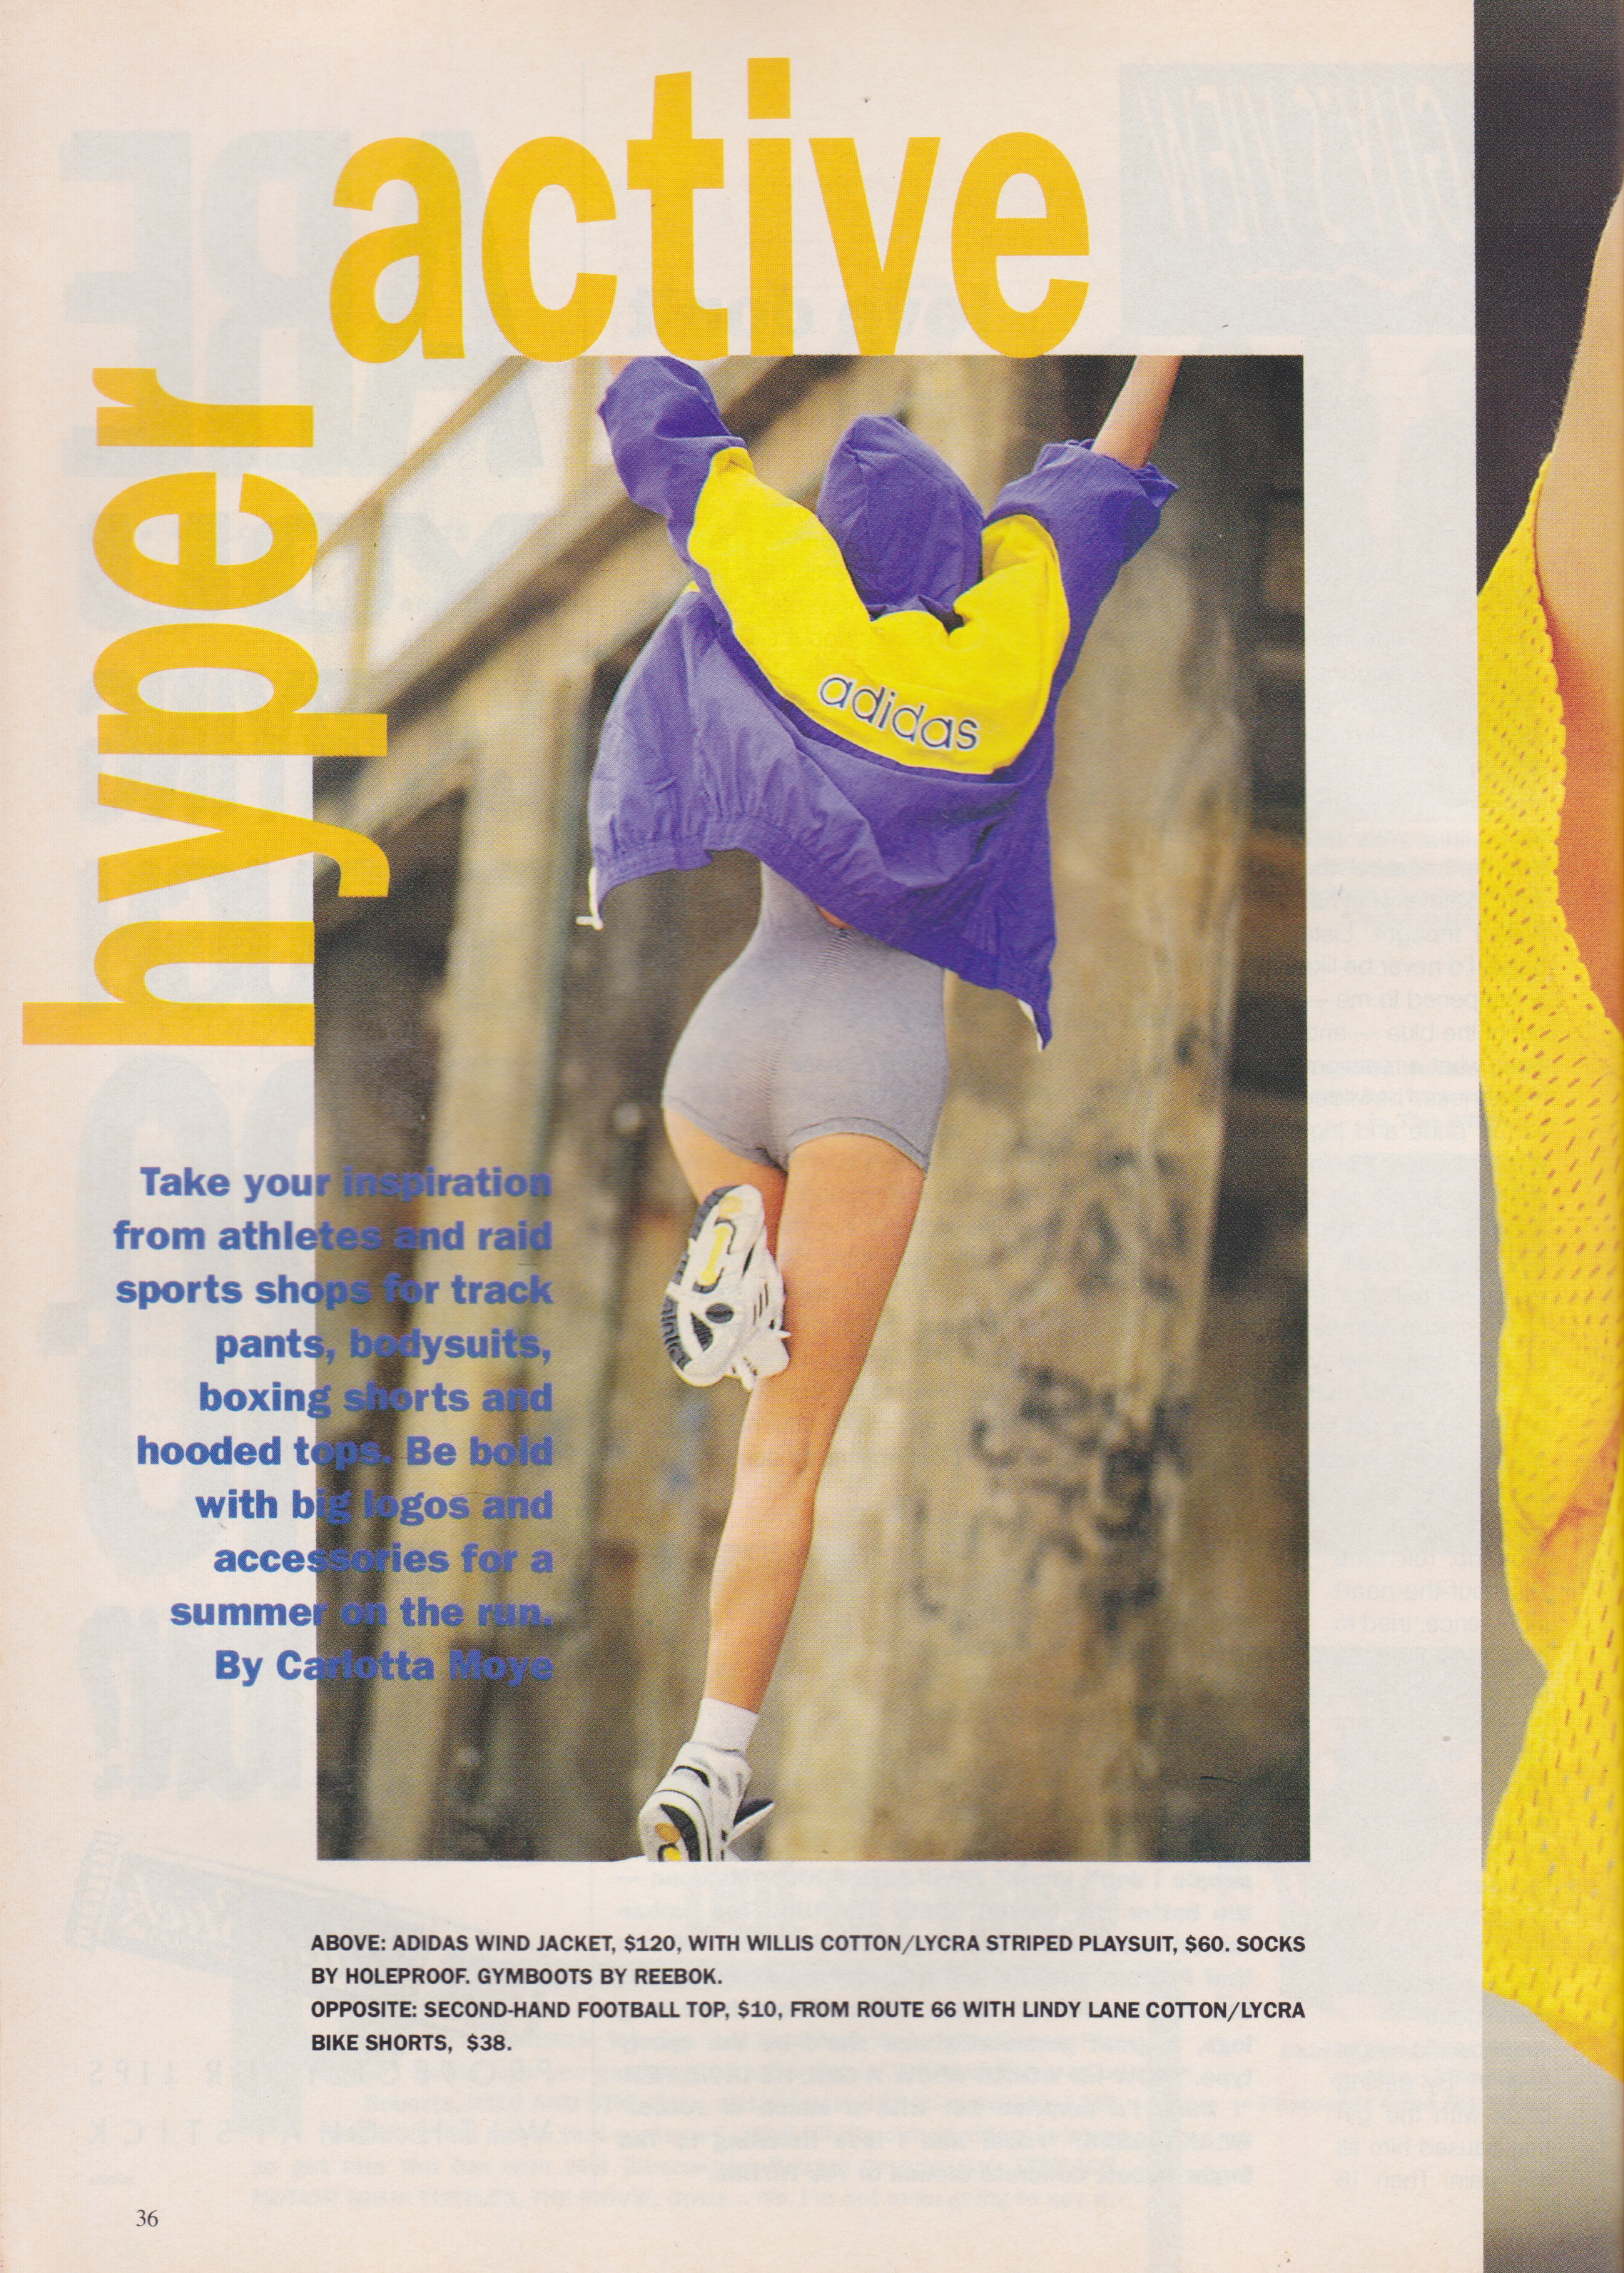 Dolly January 1991 | Rachel Cyriacs | Hyper Active 01.jpeg